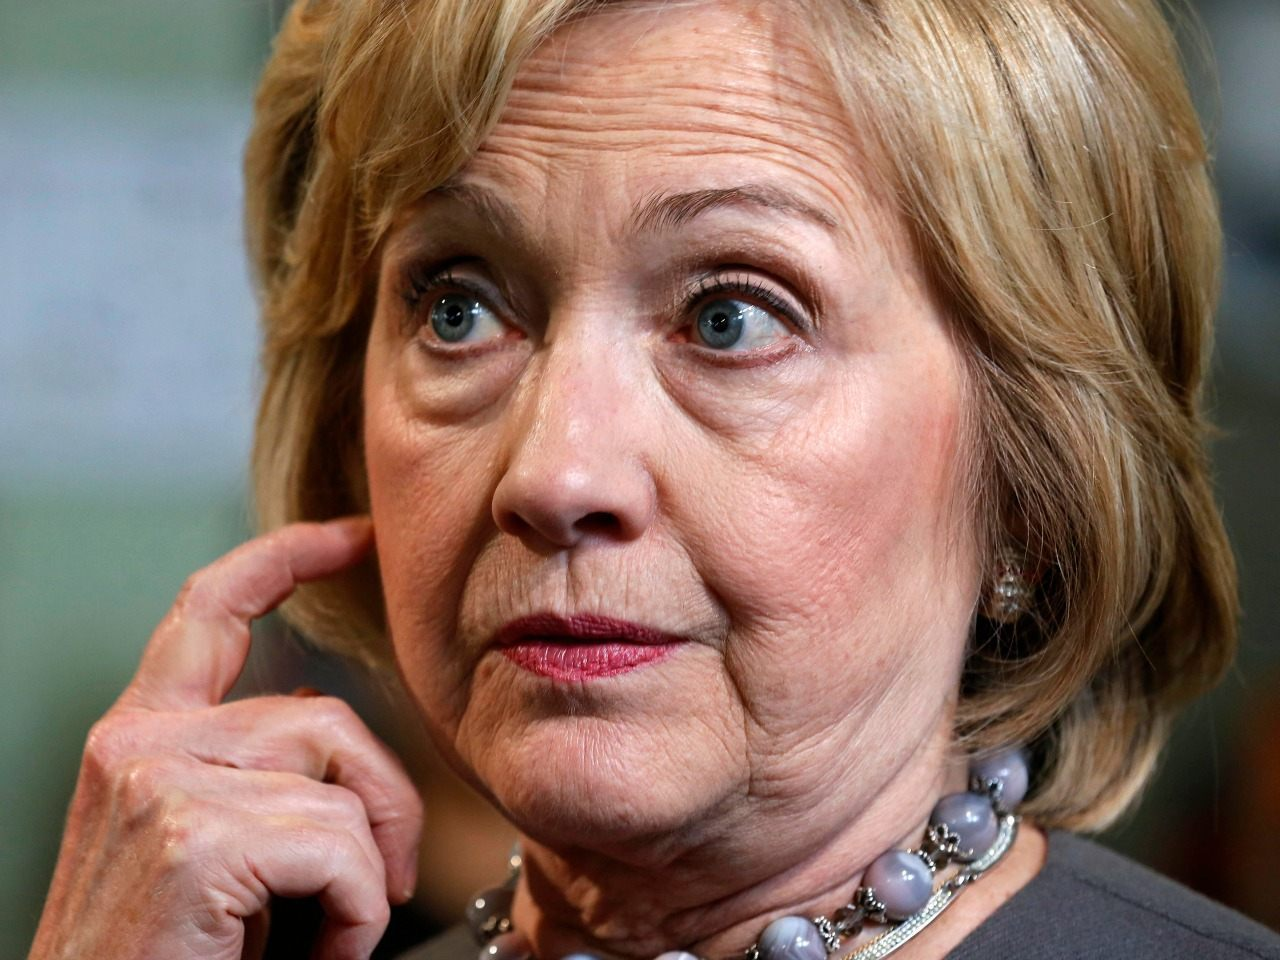 Hillary Clinton Looks Old